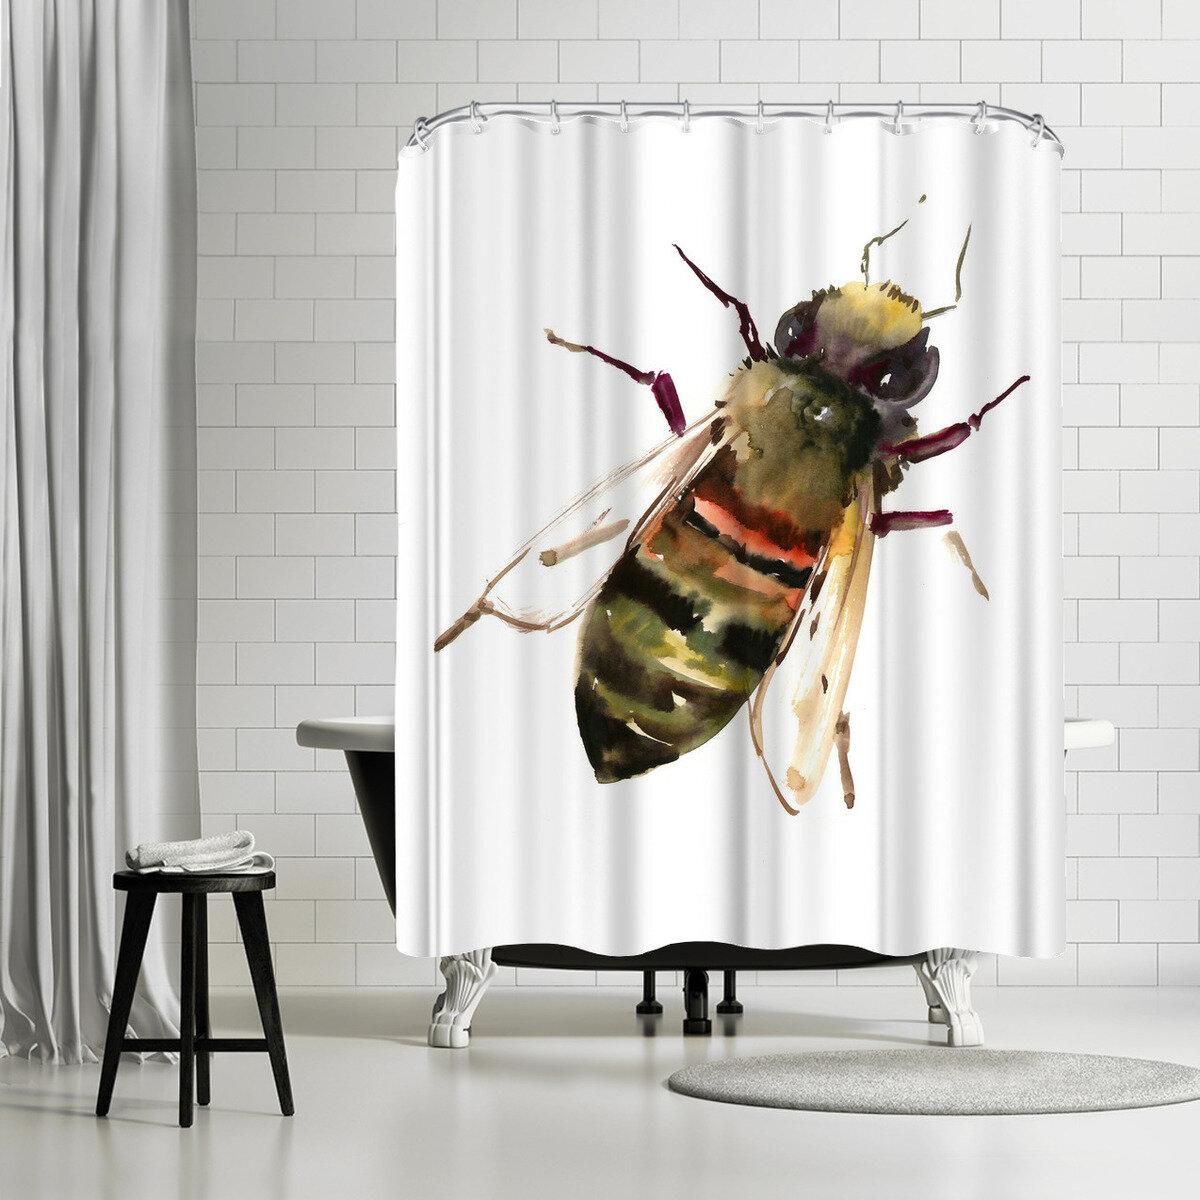 East Urban Home Suren Nersisyan Honey Bee Single Shower Curtain Wayfair